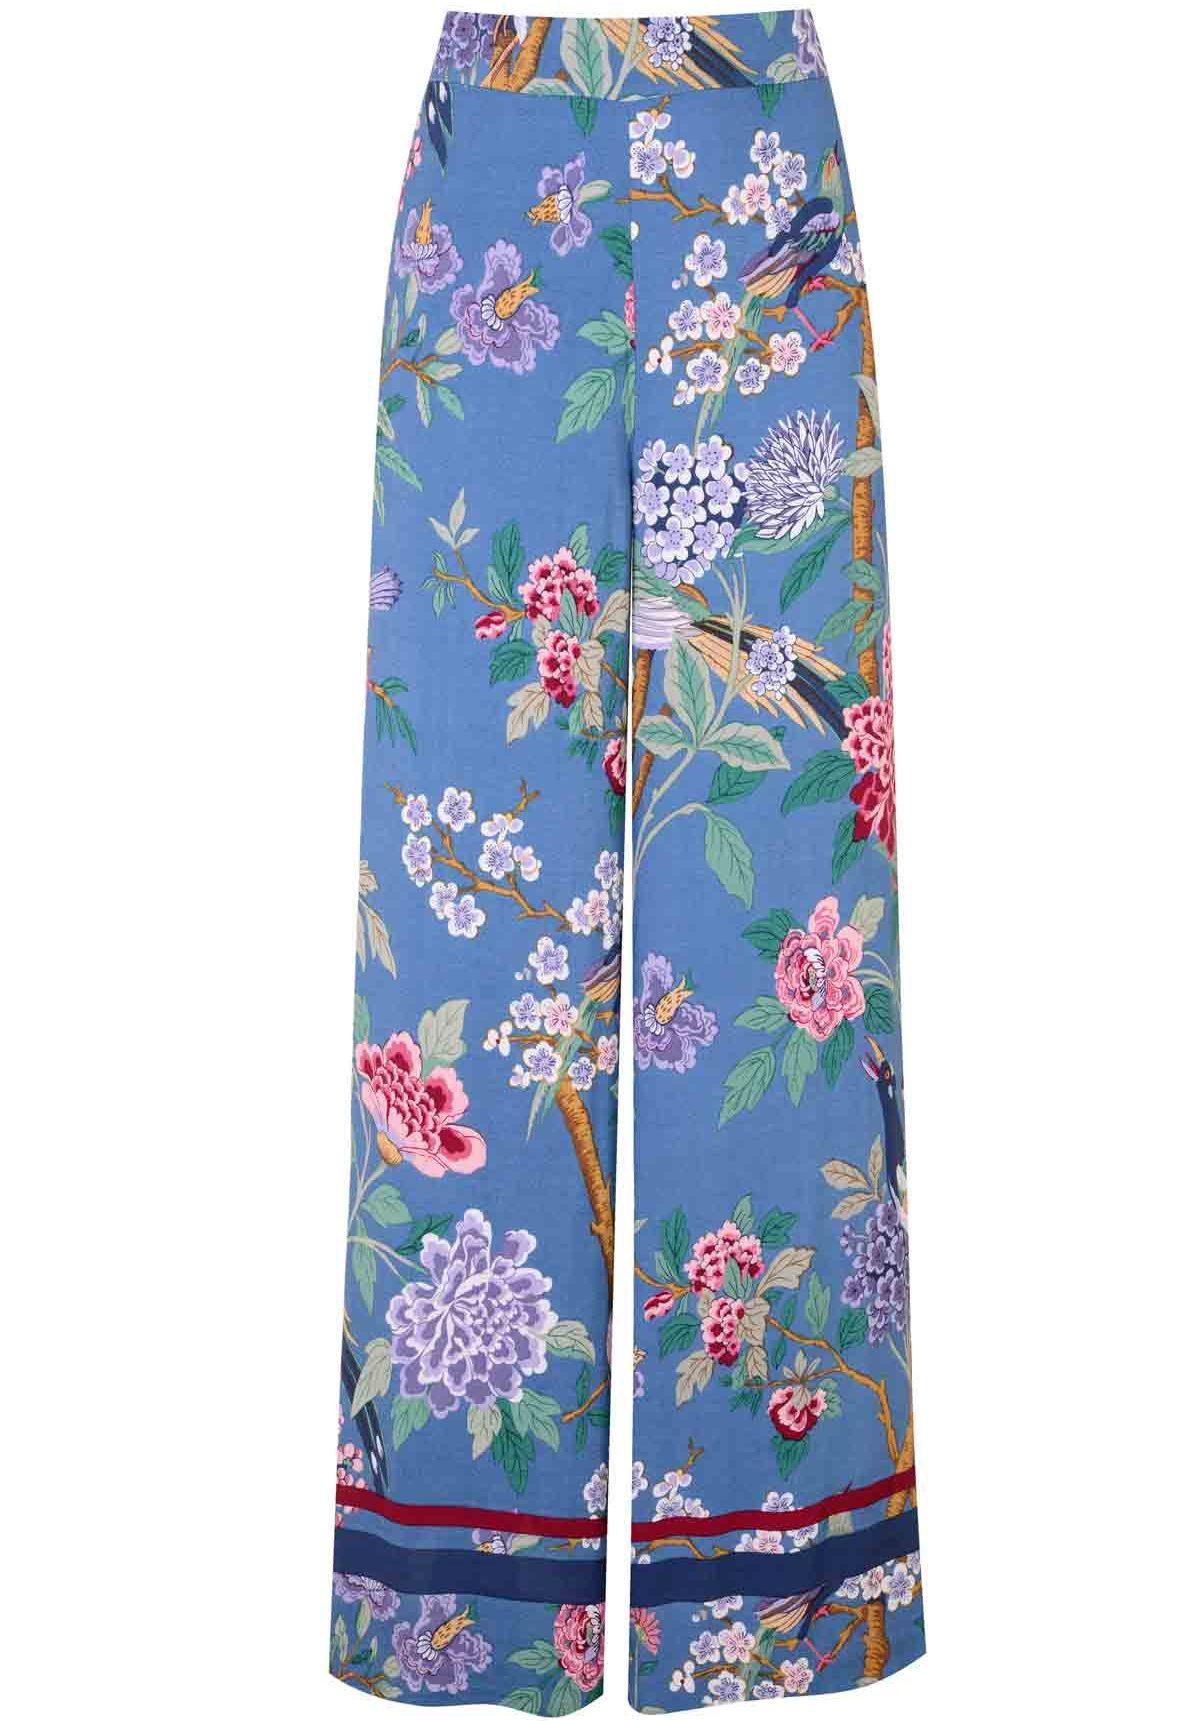 db093fc49e38 GP & J Baker x H&M Hydrangea Bird Trousers, £34.99